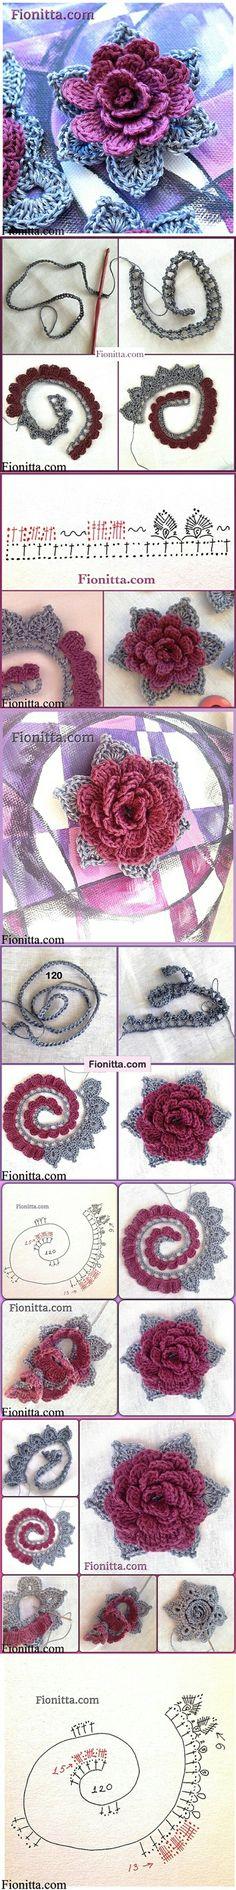 486edca48be8 88 best crochet images on Pinterest   Hand crafts, Crochet patterns ...